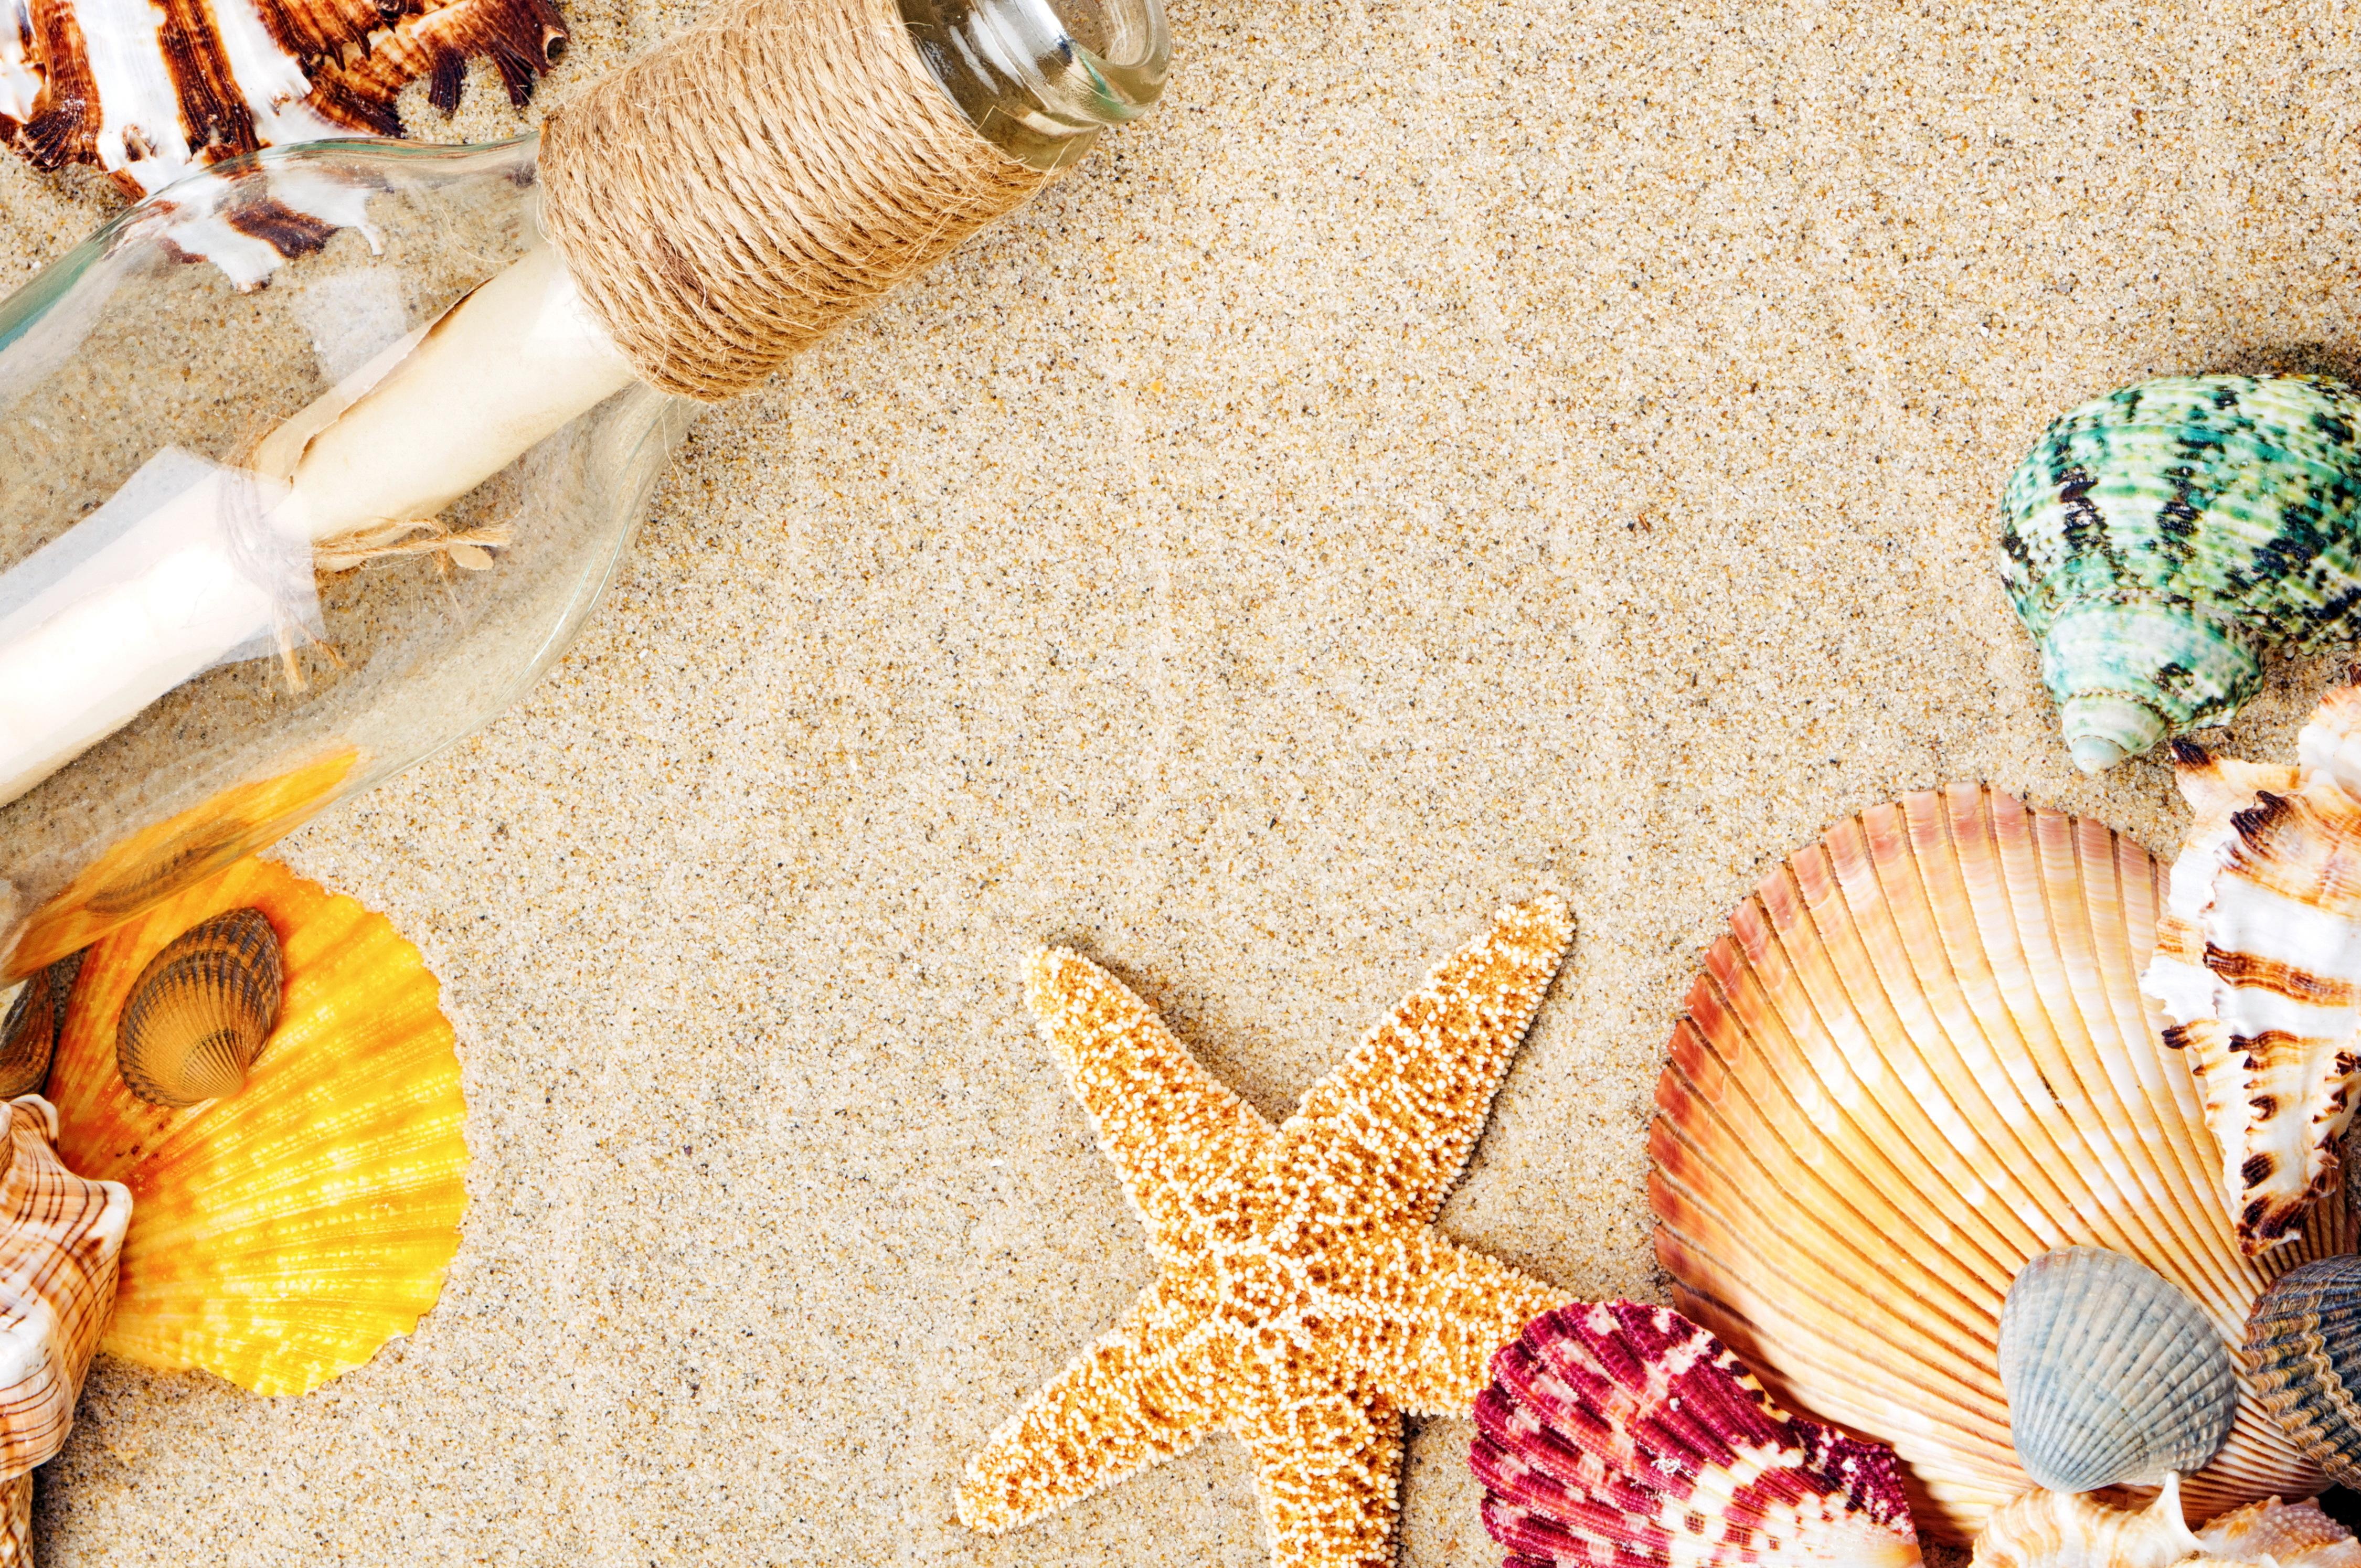 красивая картинка море песок ракушки тяжелые желтые